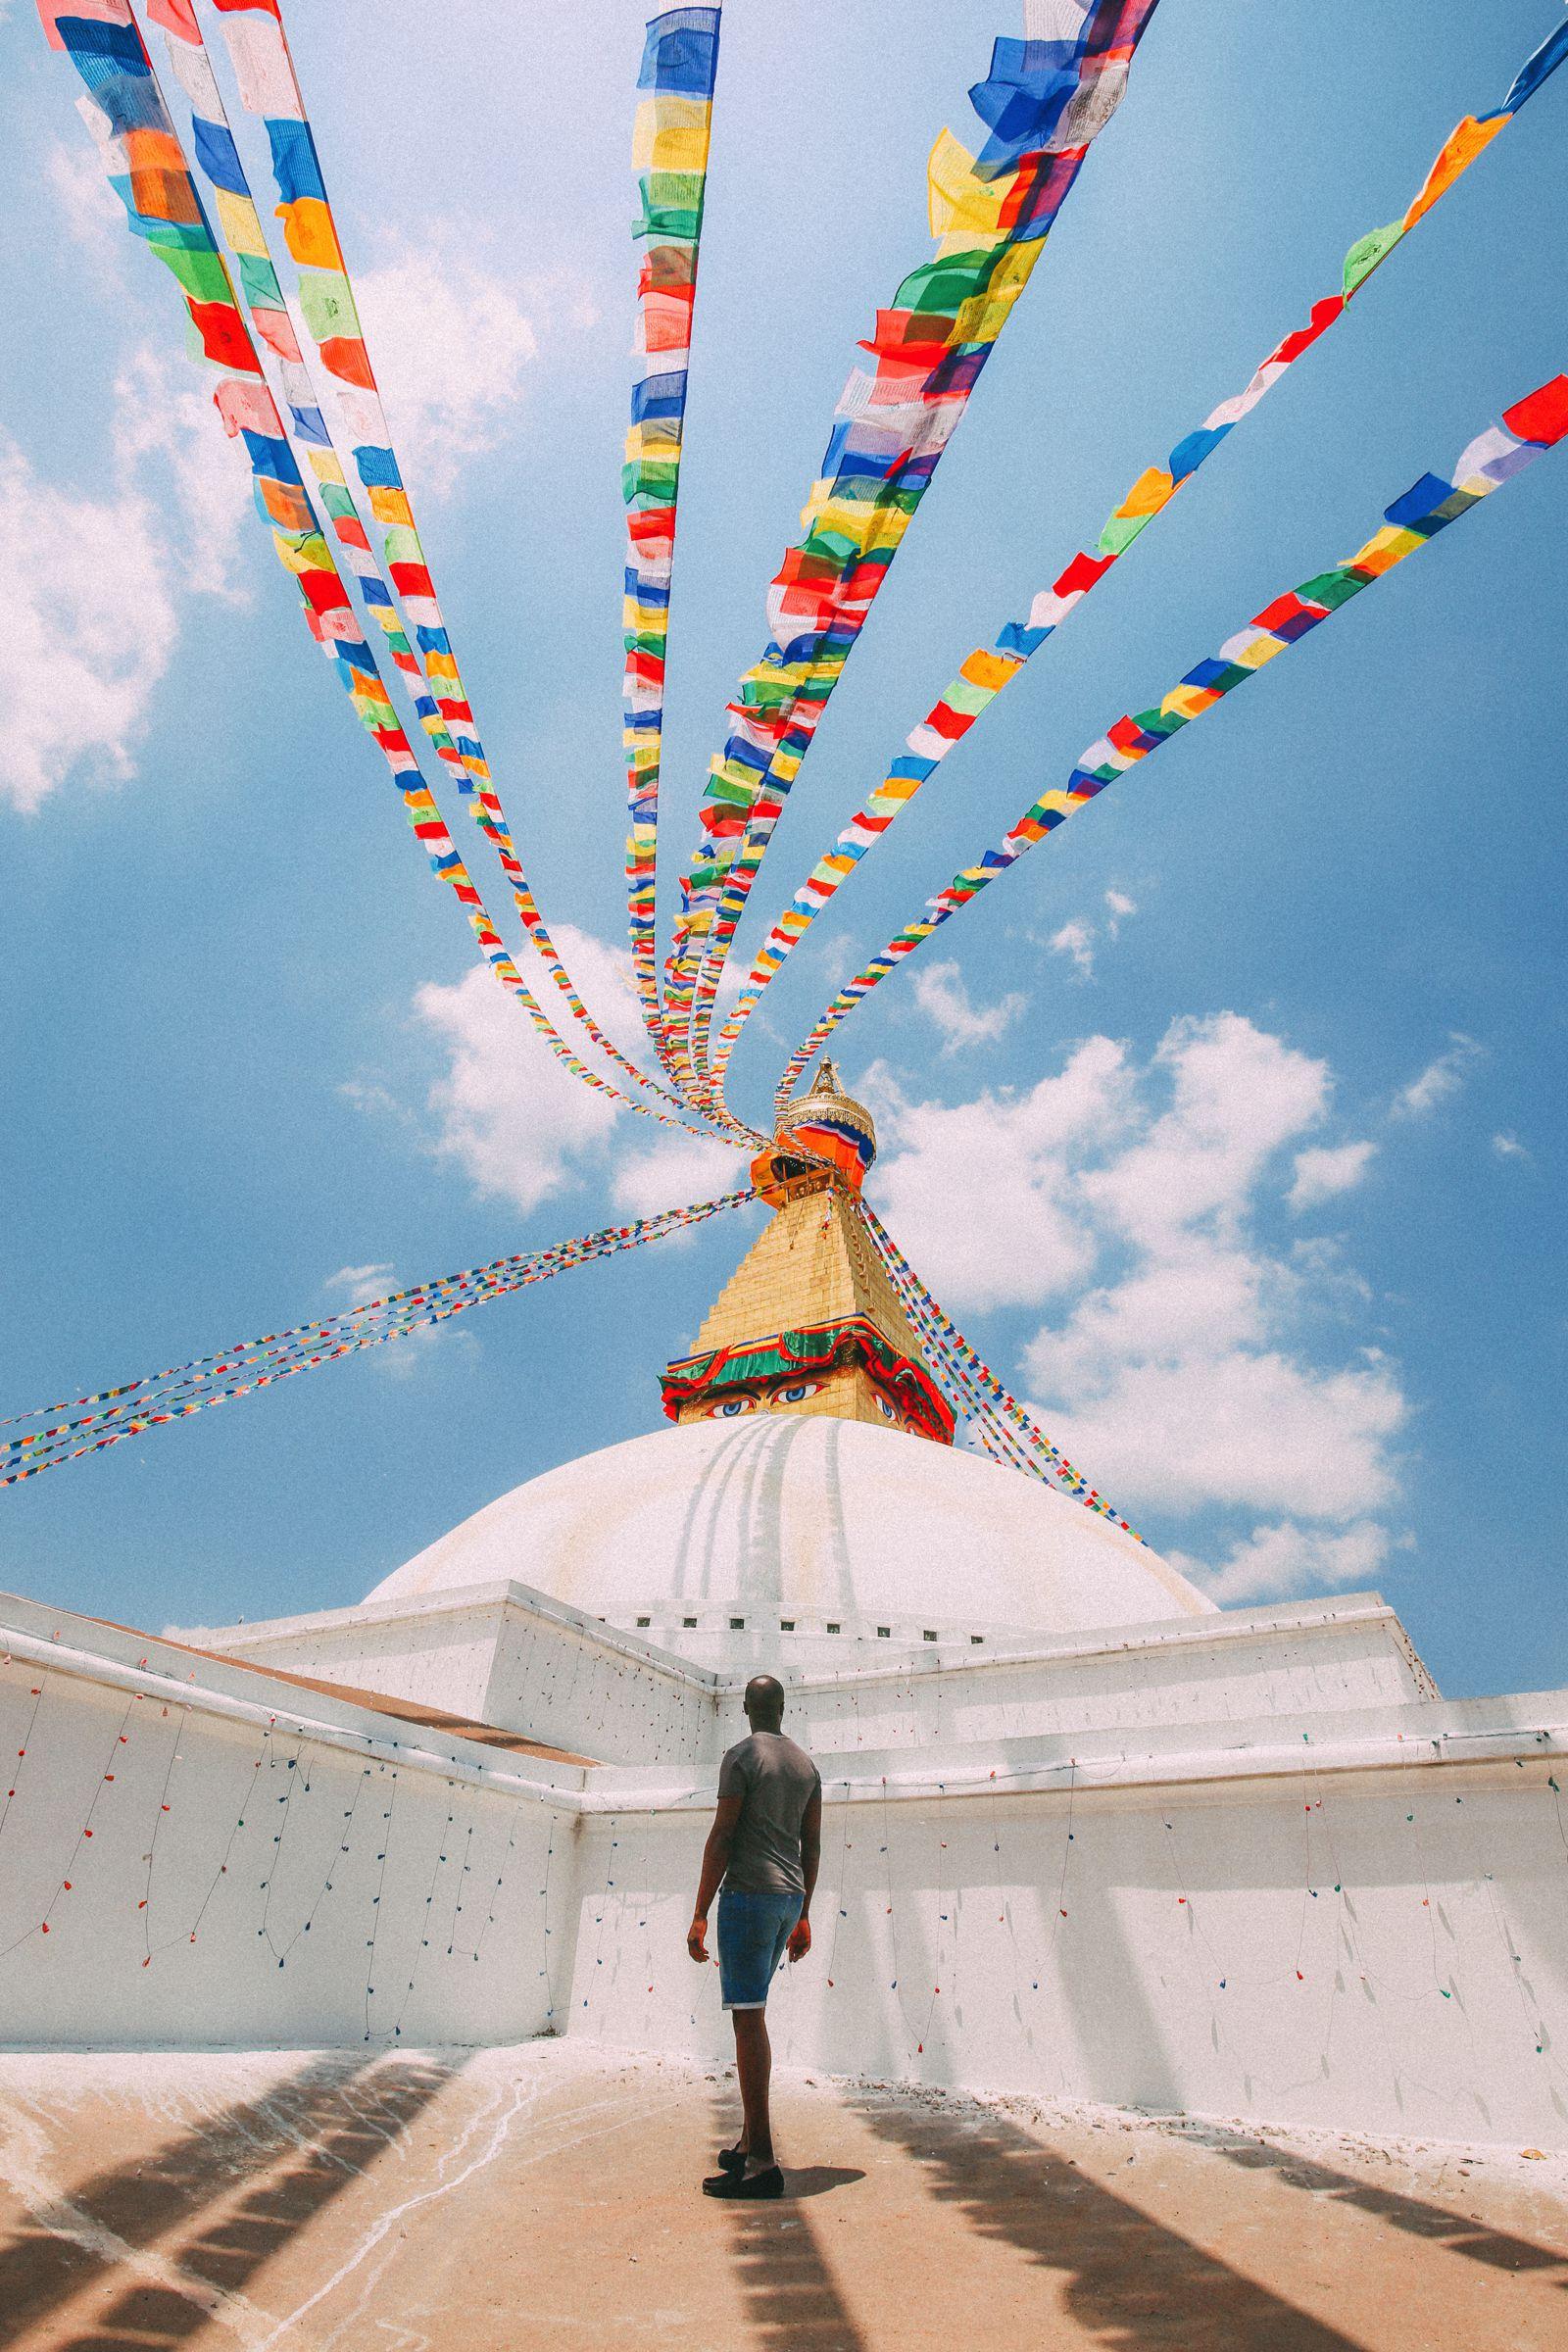 The UNESCO World Heritage Site Of Boudhanath Stupa In Kathmandu, Nepal (11)